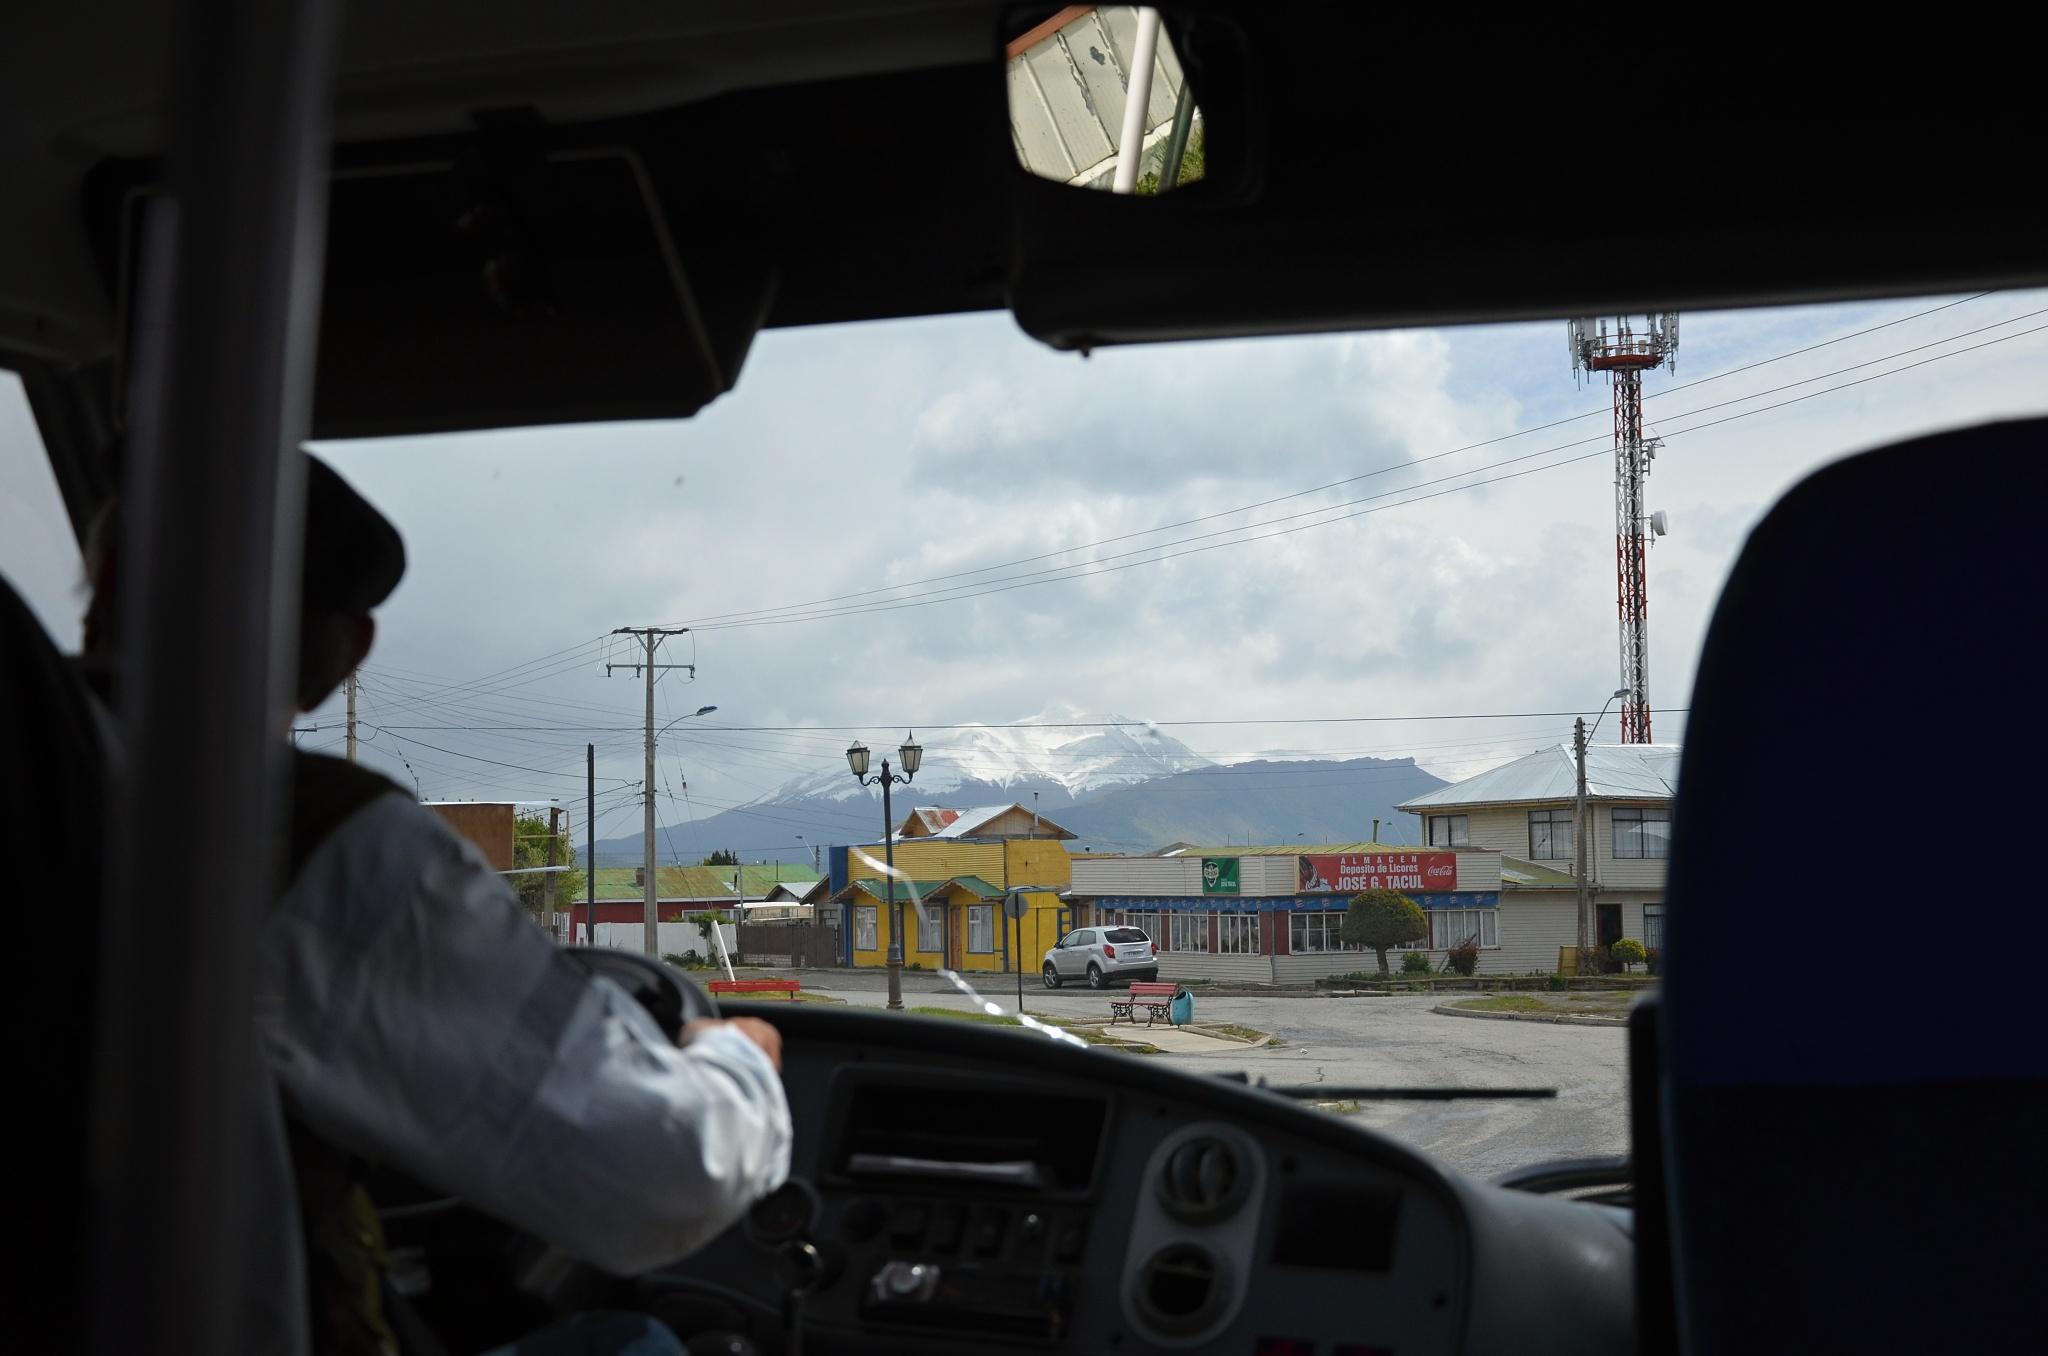 Vydáváme se na cestu do Torres del Paine